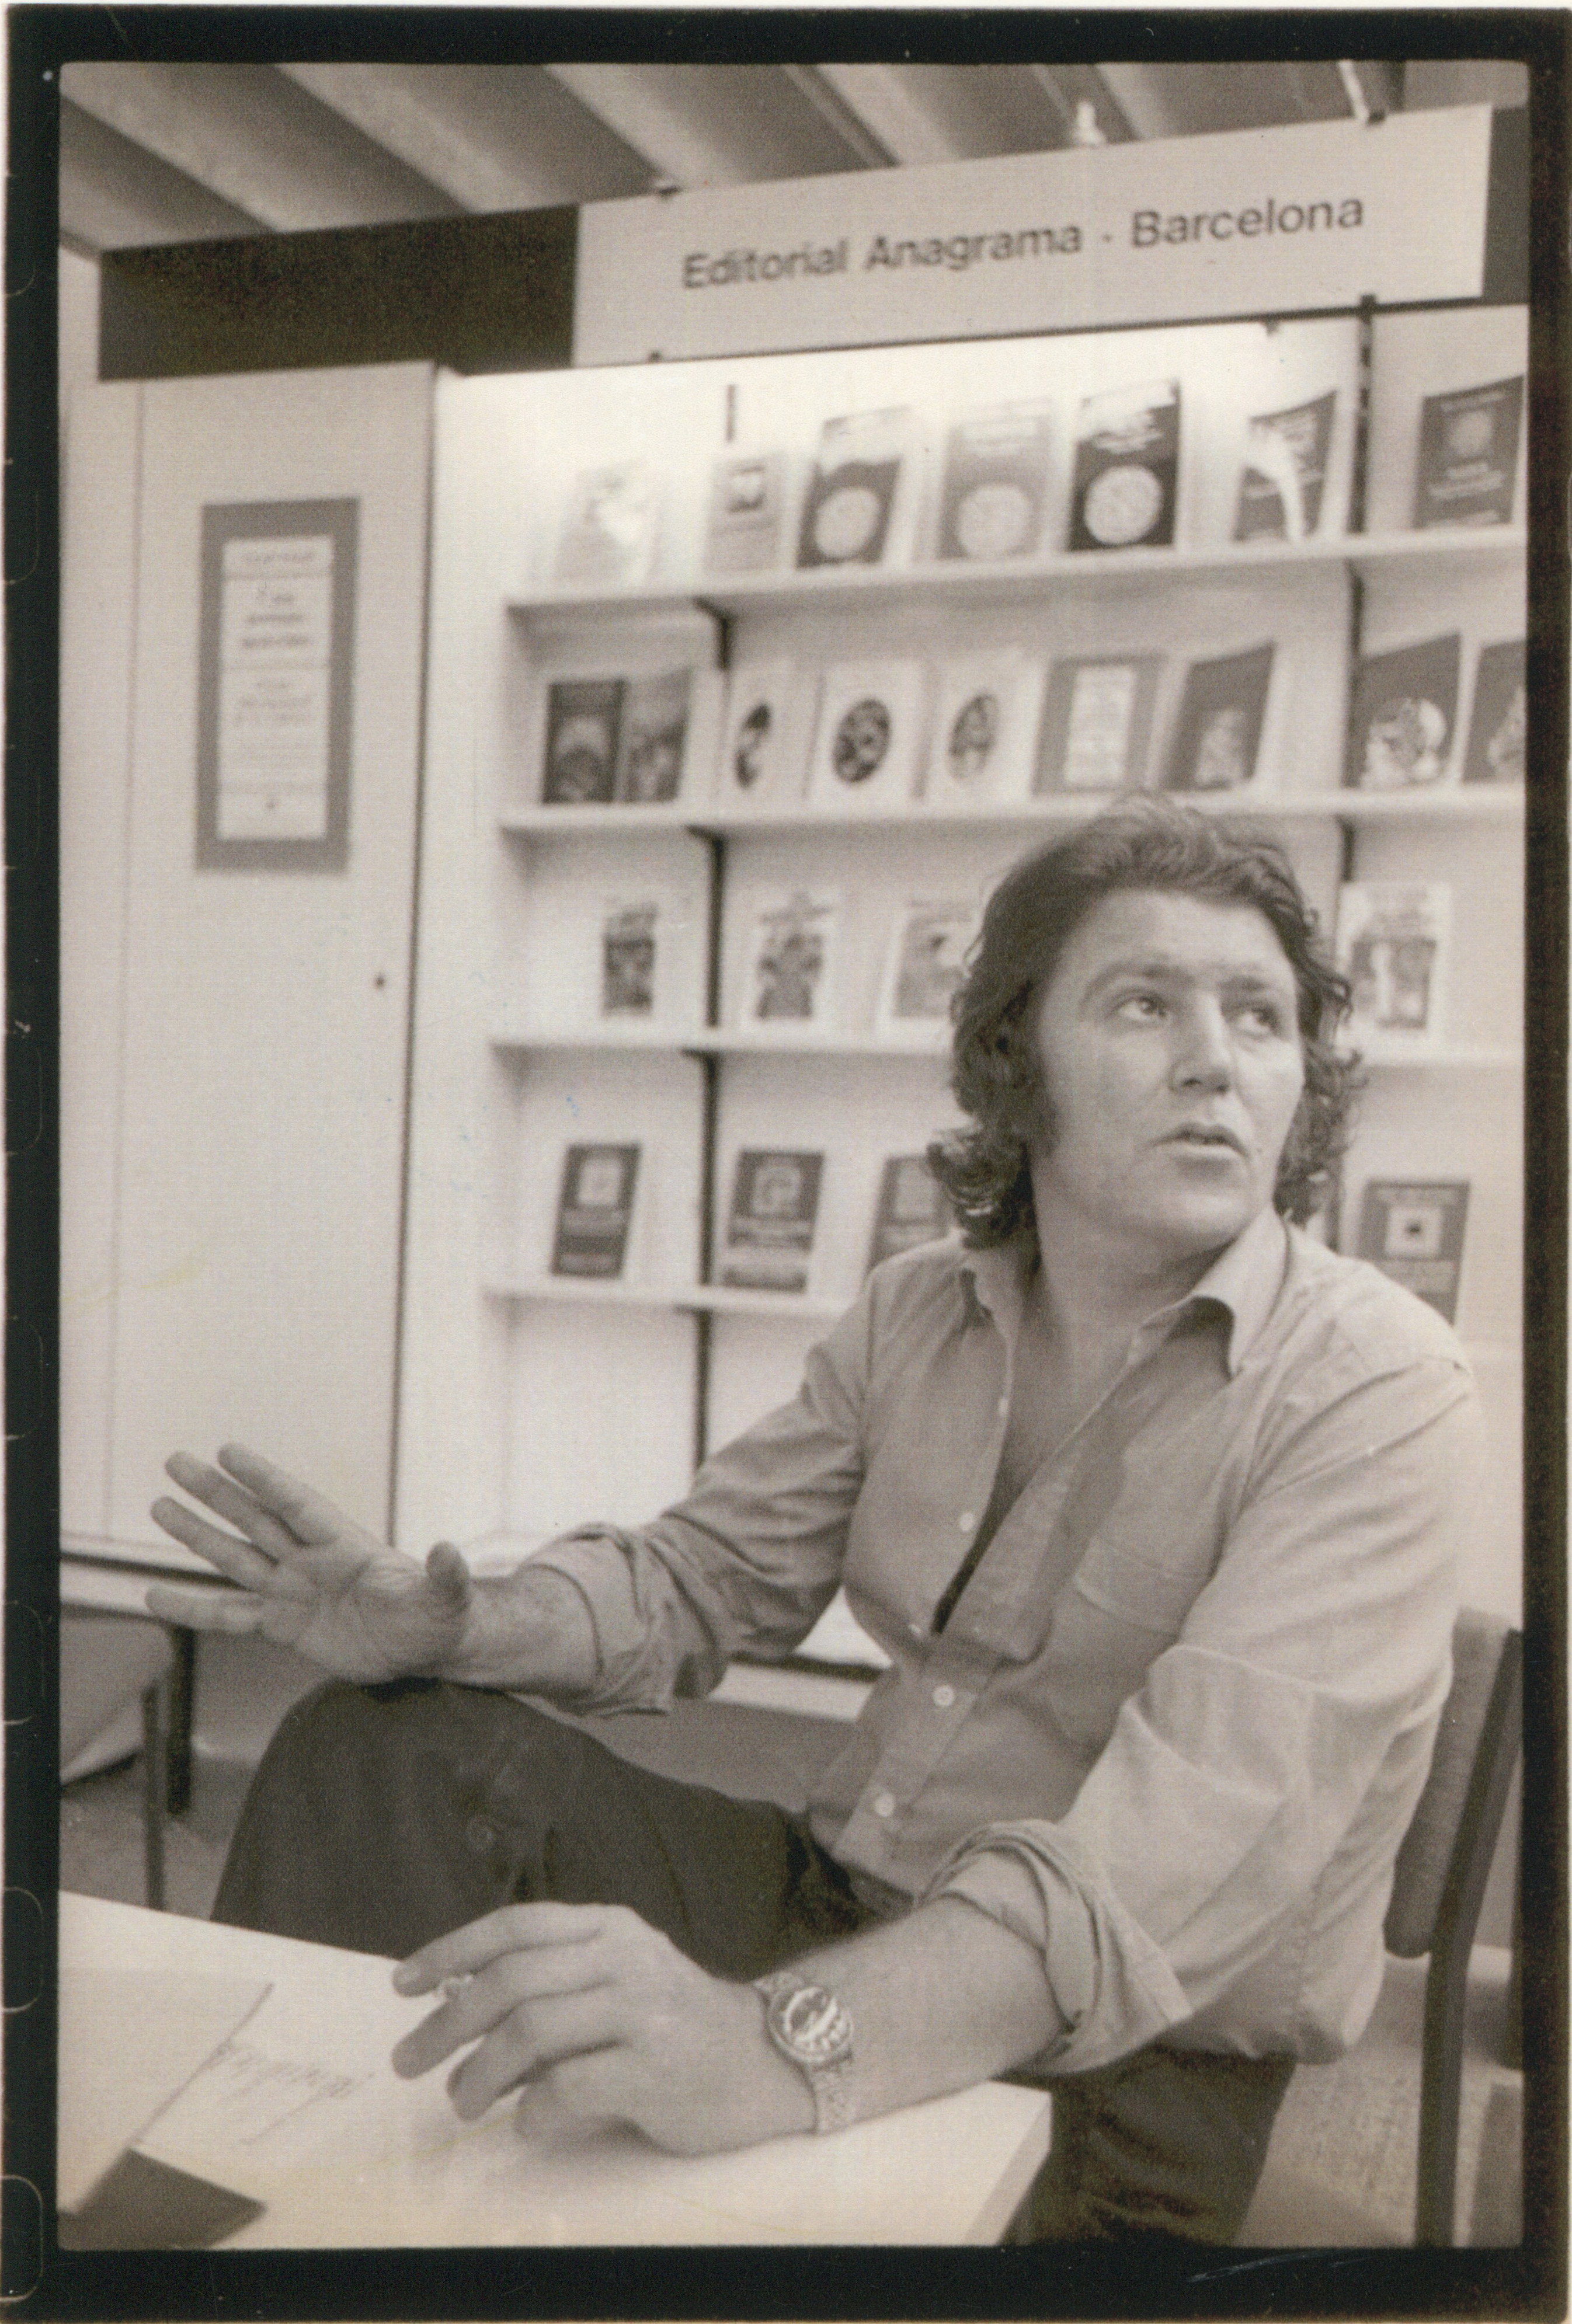 Jorge HERRALDE en el stand de Anagrama en la Feria de Frankfurt de 1977.